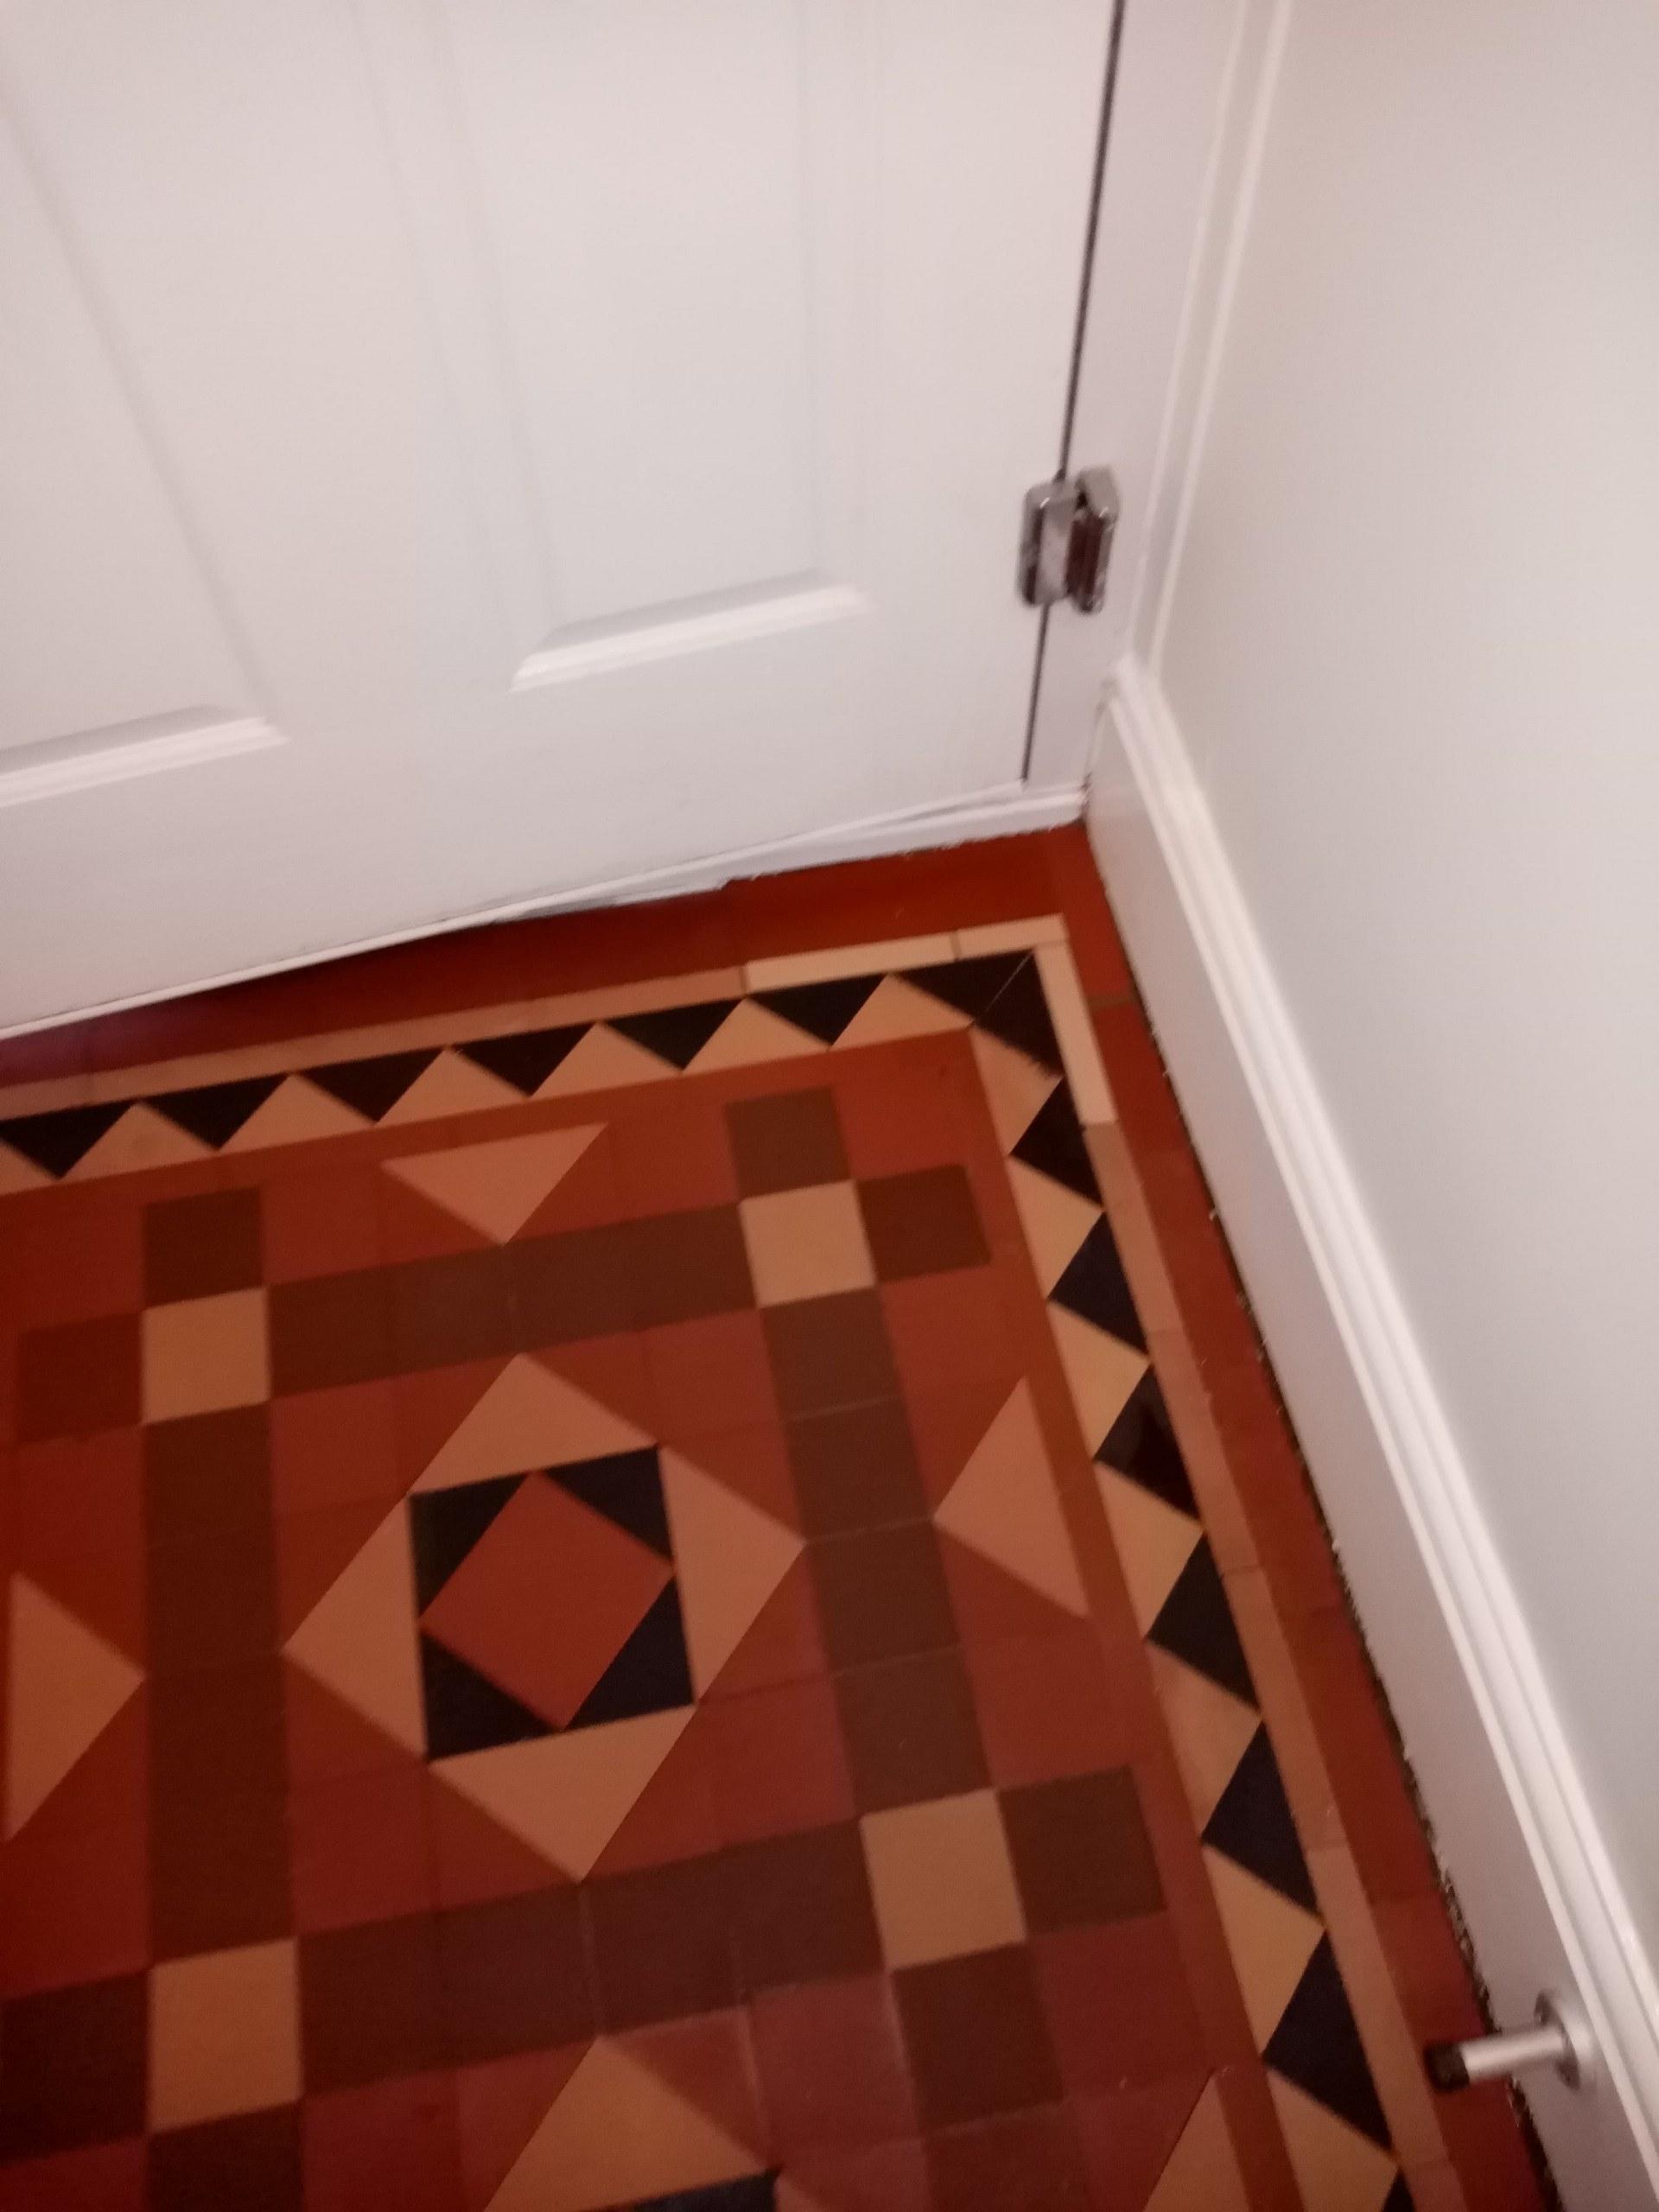 Victorian Tiled Hallway Floor After Repair Nailsworth